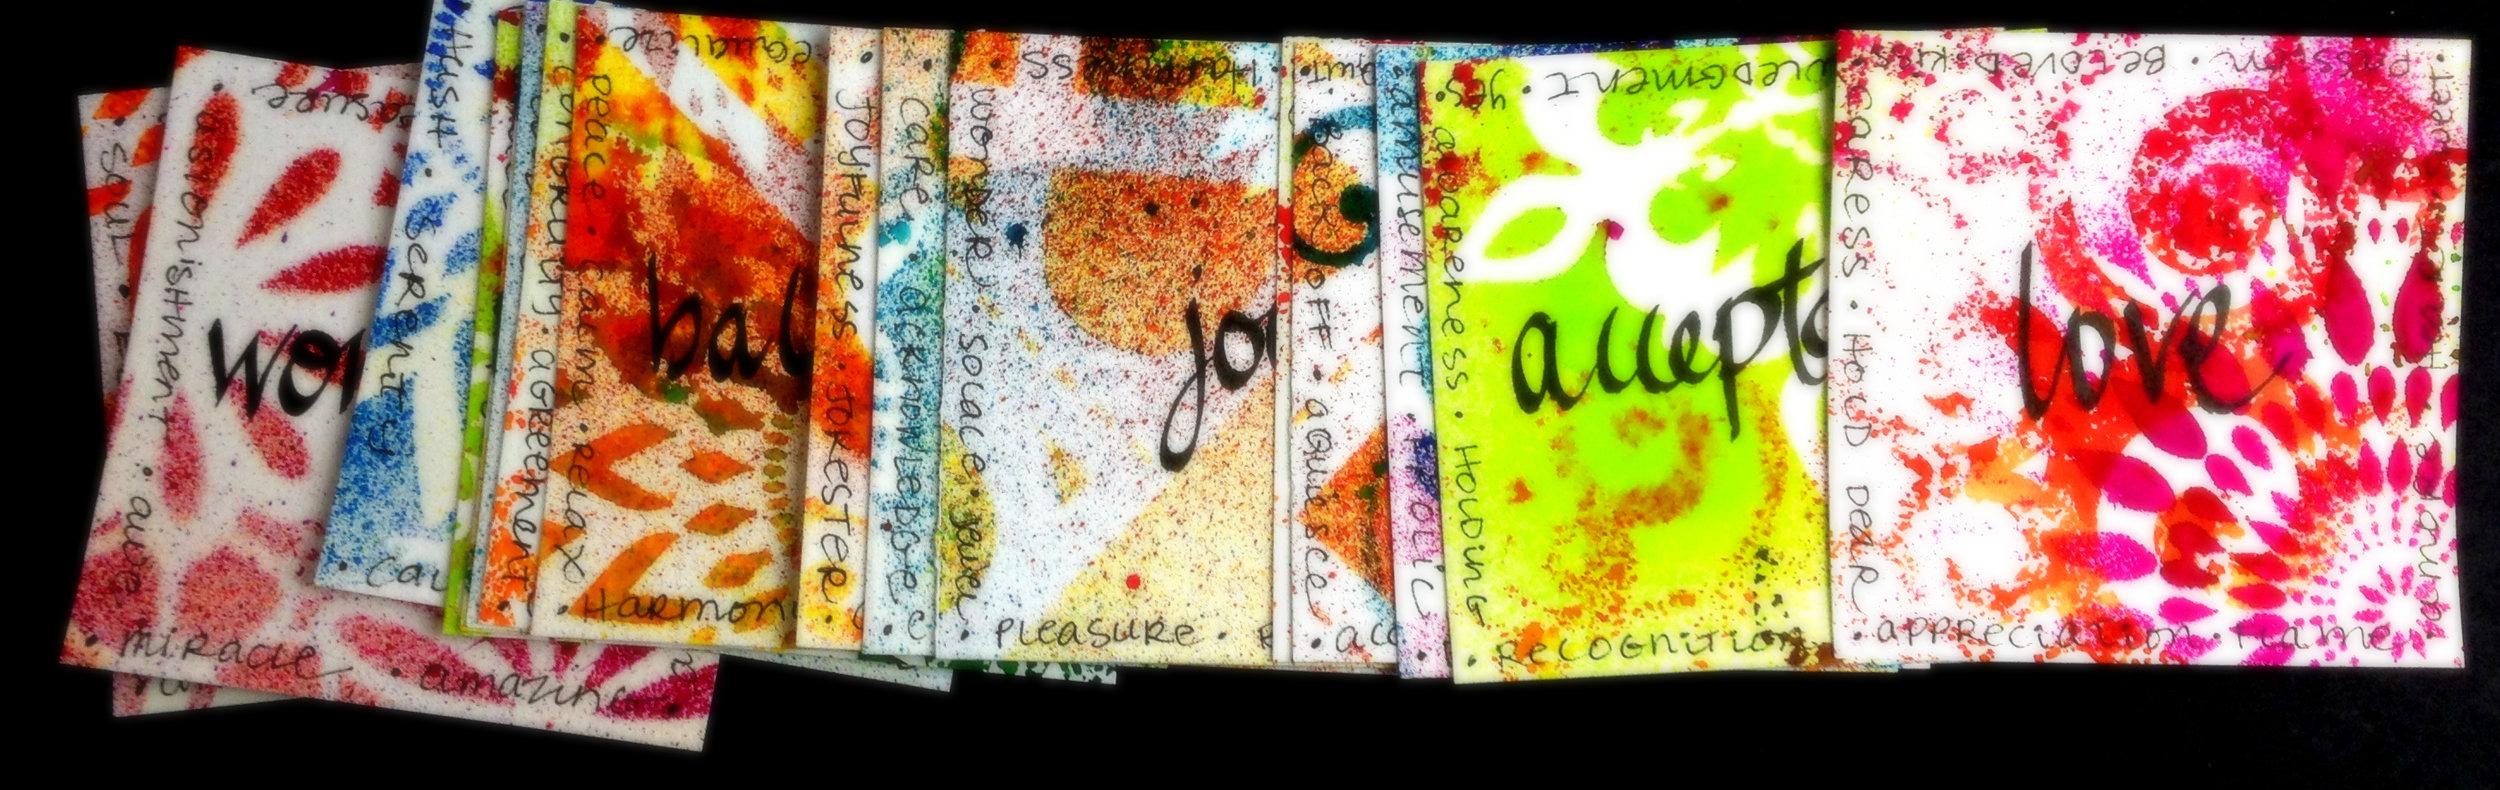 Inspiration cards